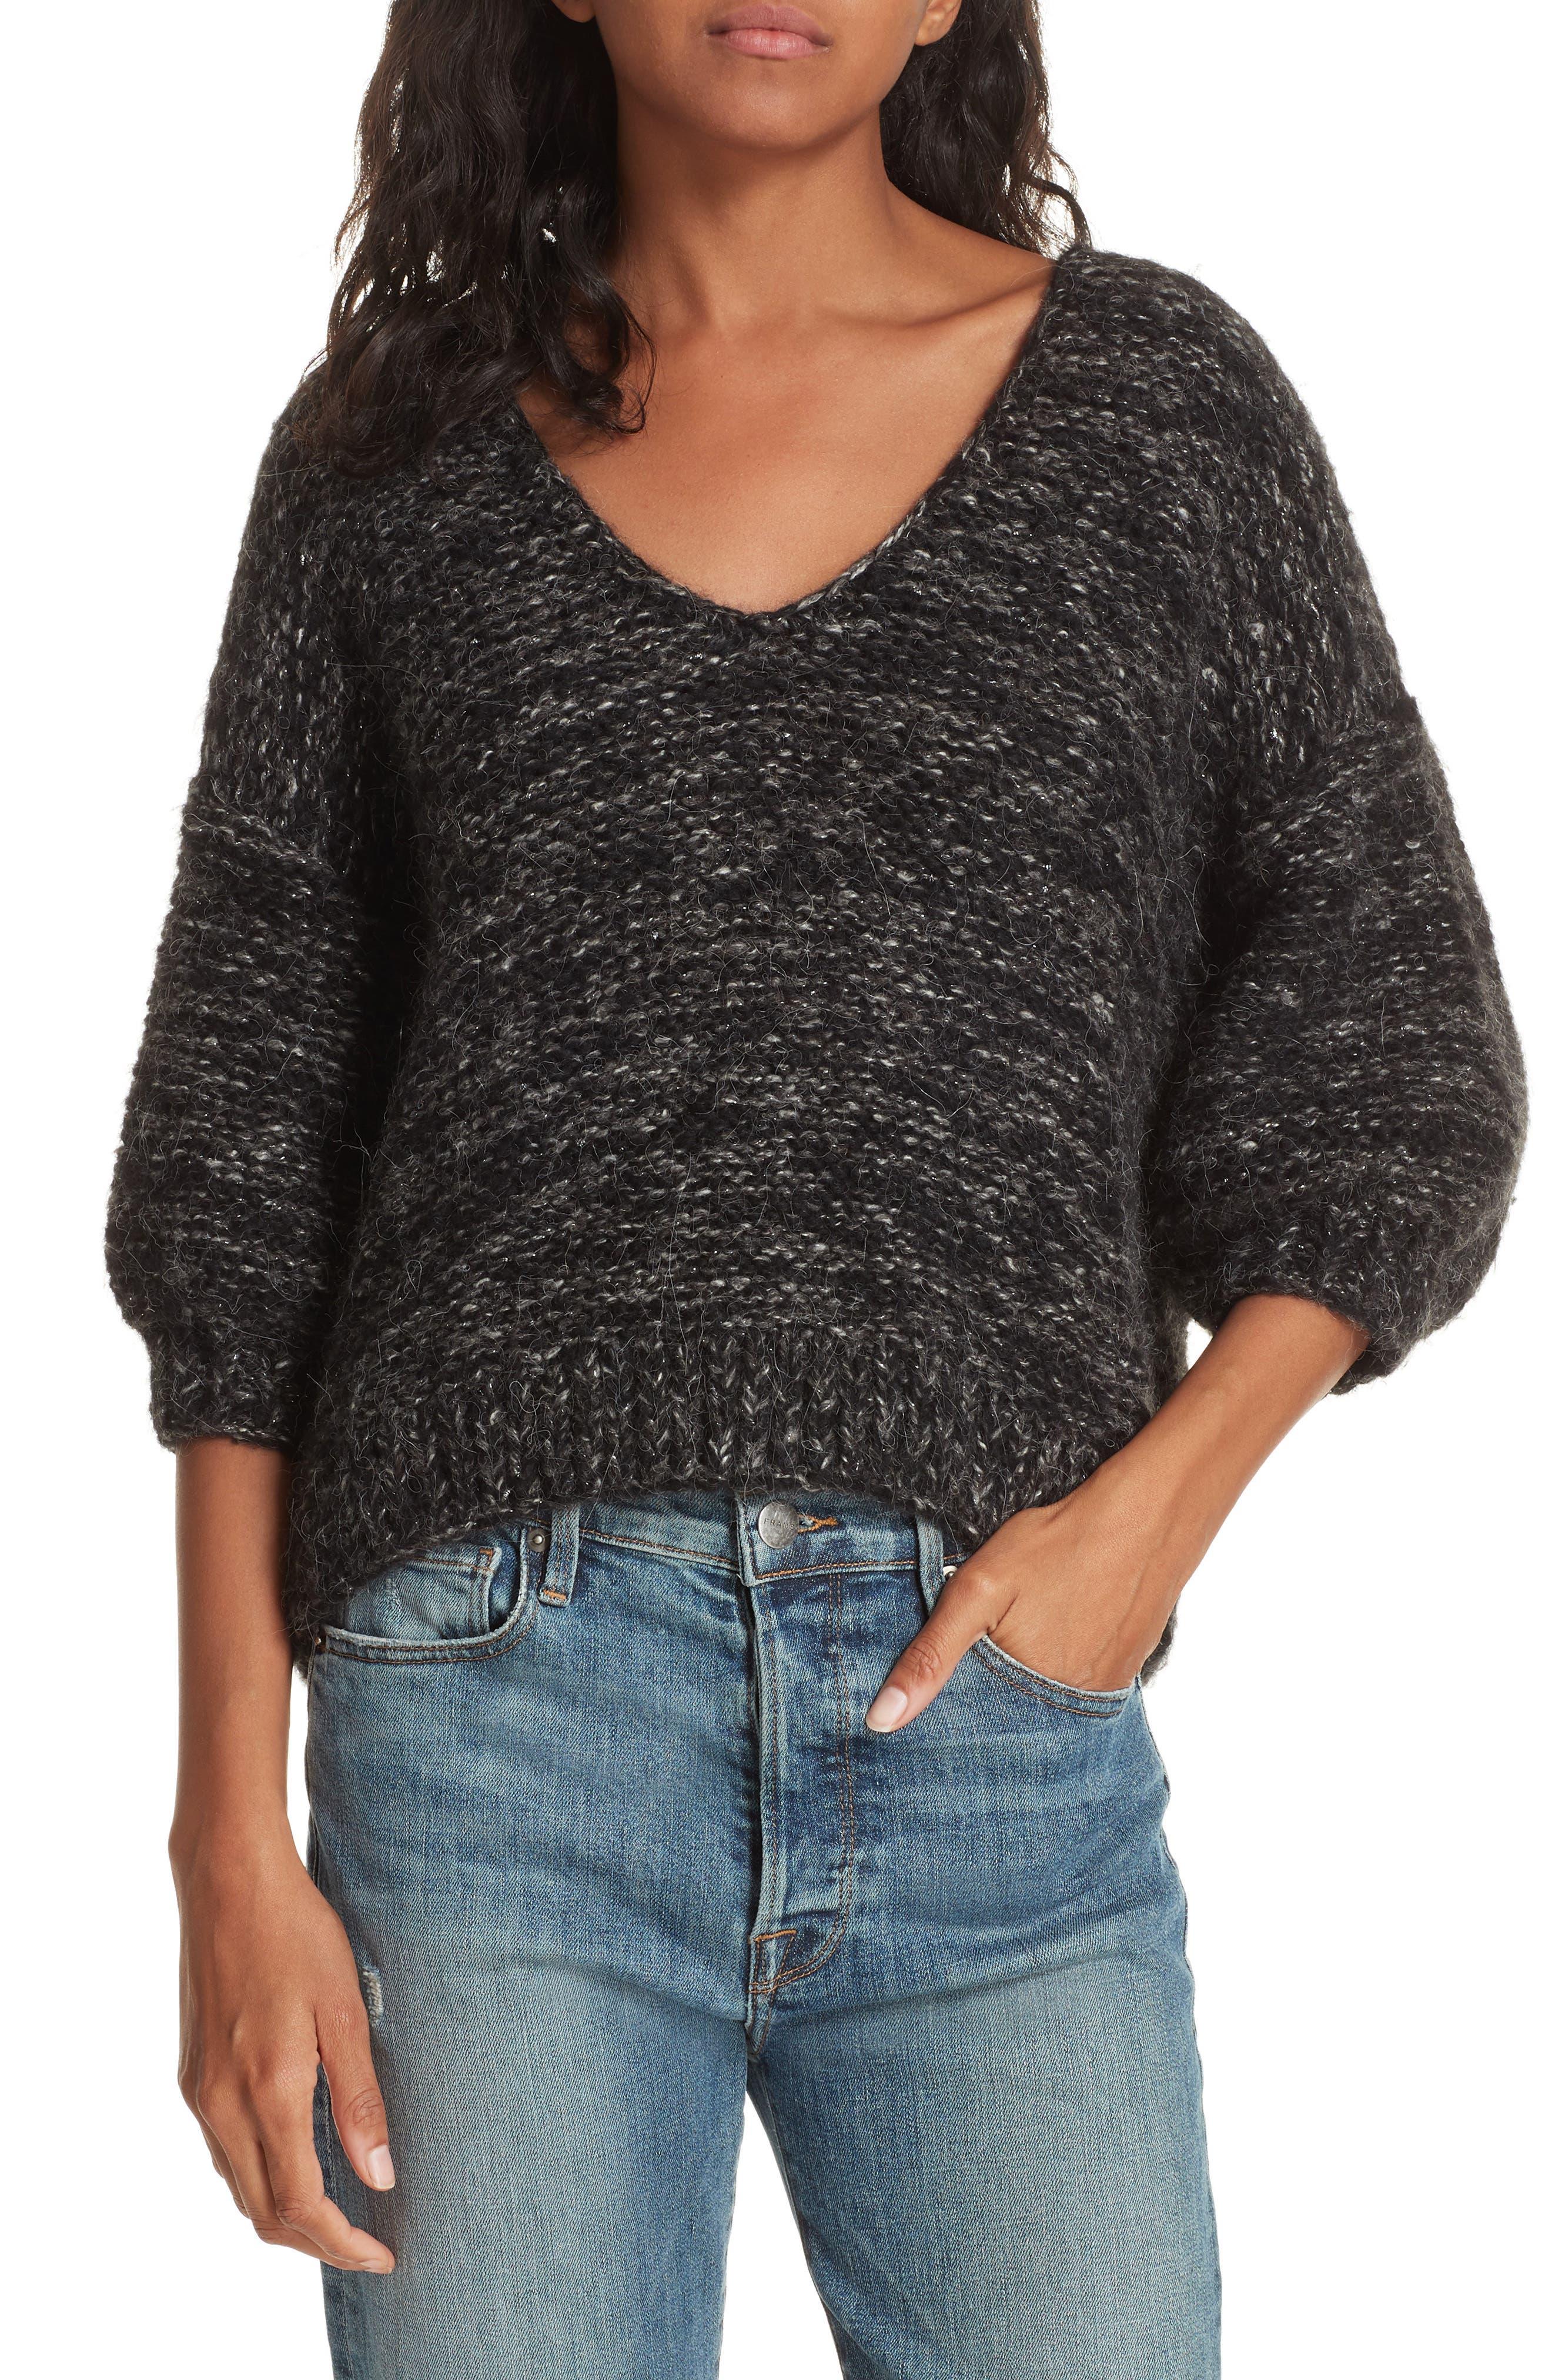 Aples Knit Blouse,                         Main,                         color, GREY COMBO